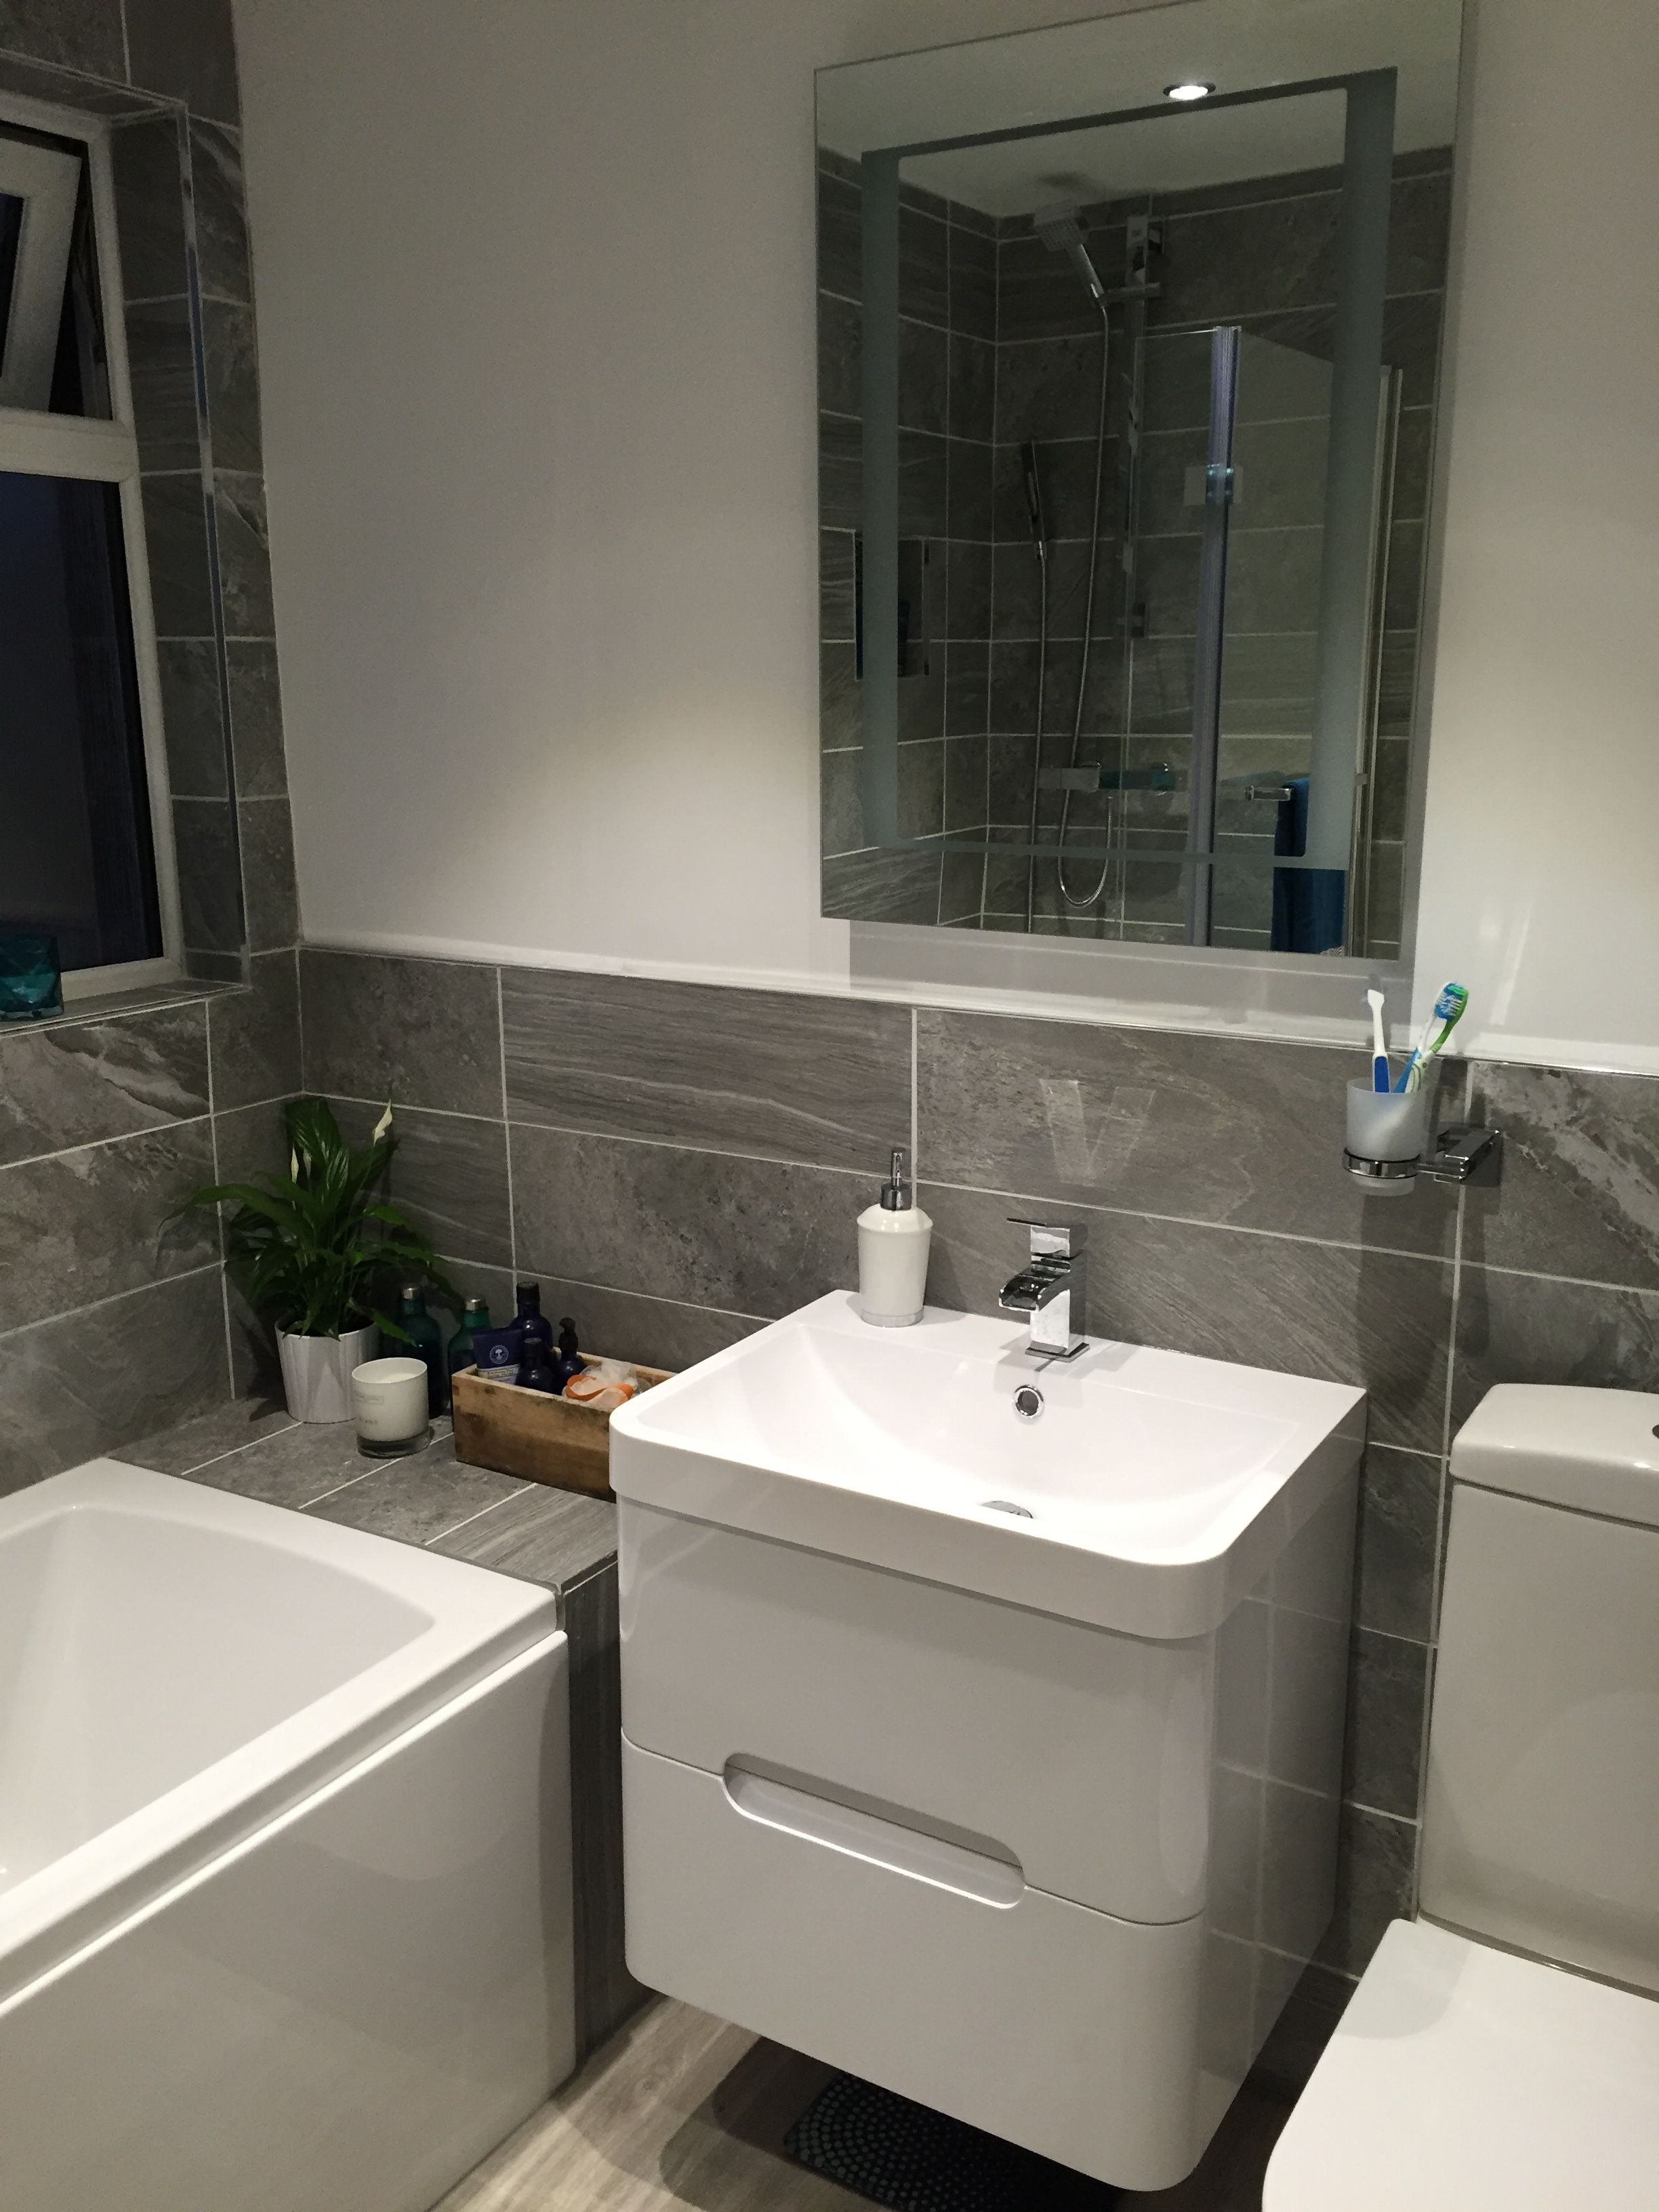 Mode Ellis White Wall Hung Vanity Drawer Unit And Basin 600mm Bathroom Vanity Units Small Bathroom Trendy Bathroom